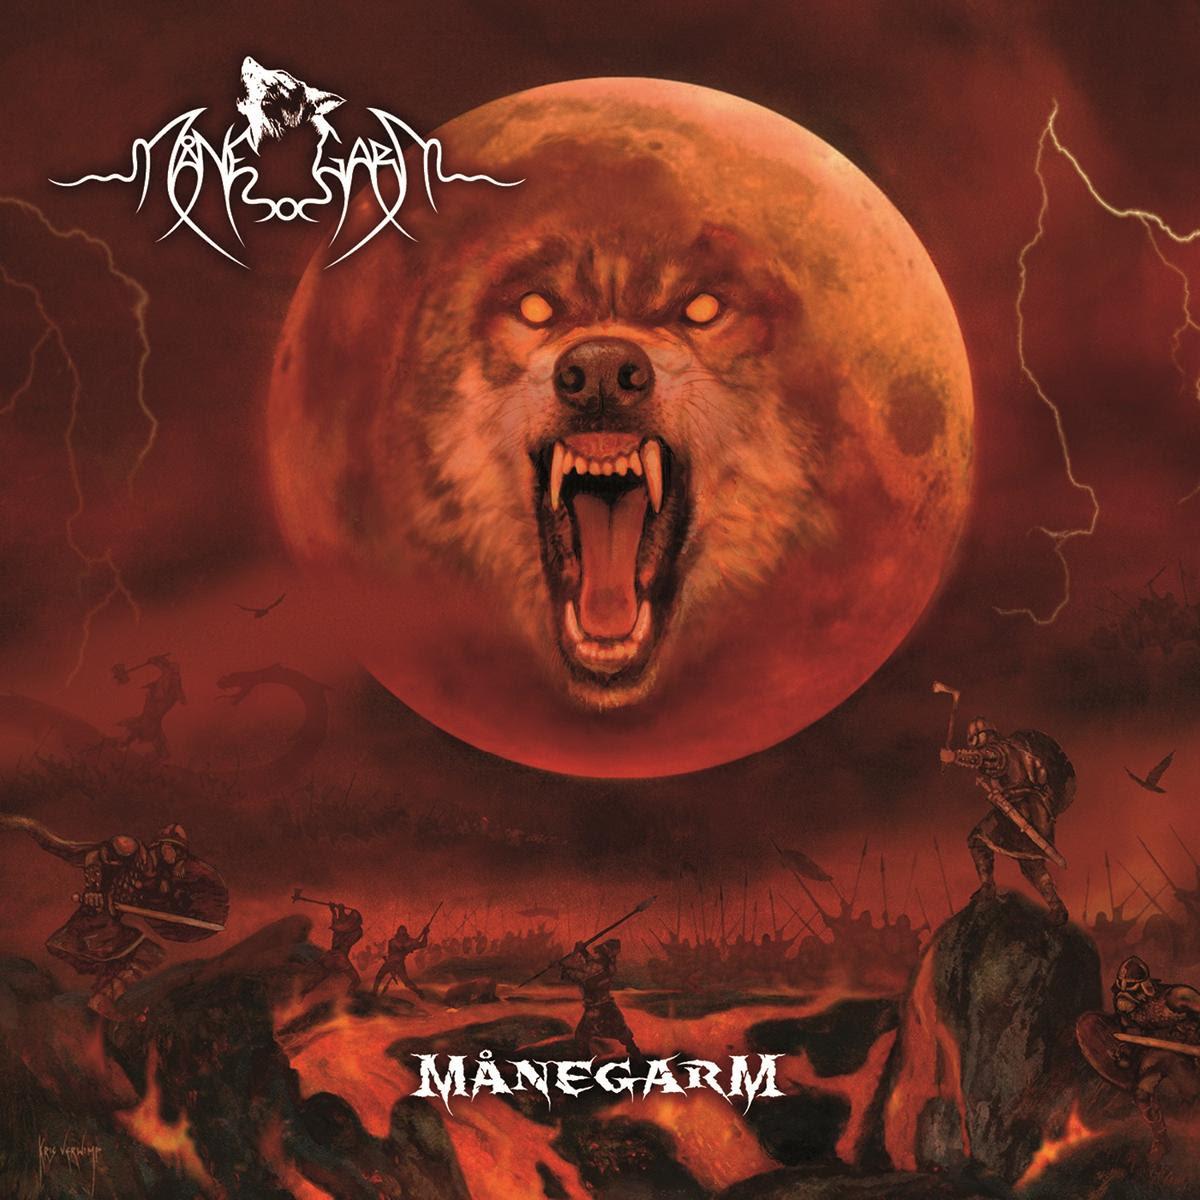 Manegarm: Manegarm (2015) Book Cover